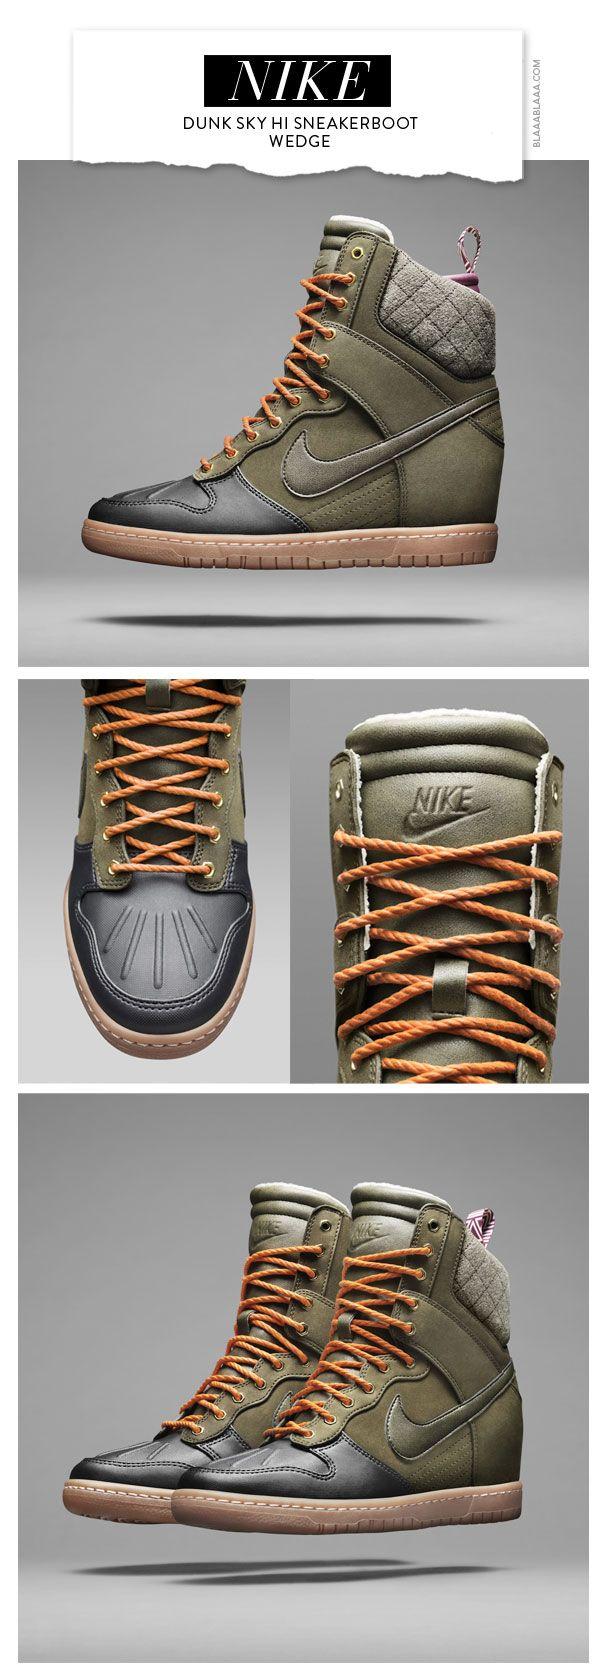 Nike Dunk Sky Hi Sneakerboot Wedge. I'm kinda torn between liking and disliking them...